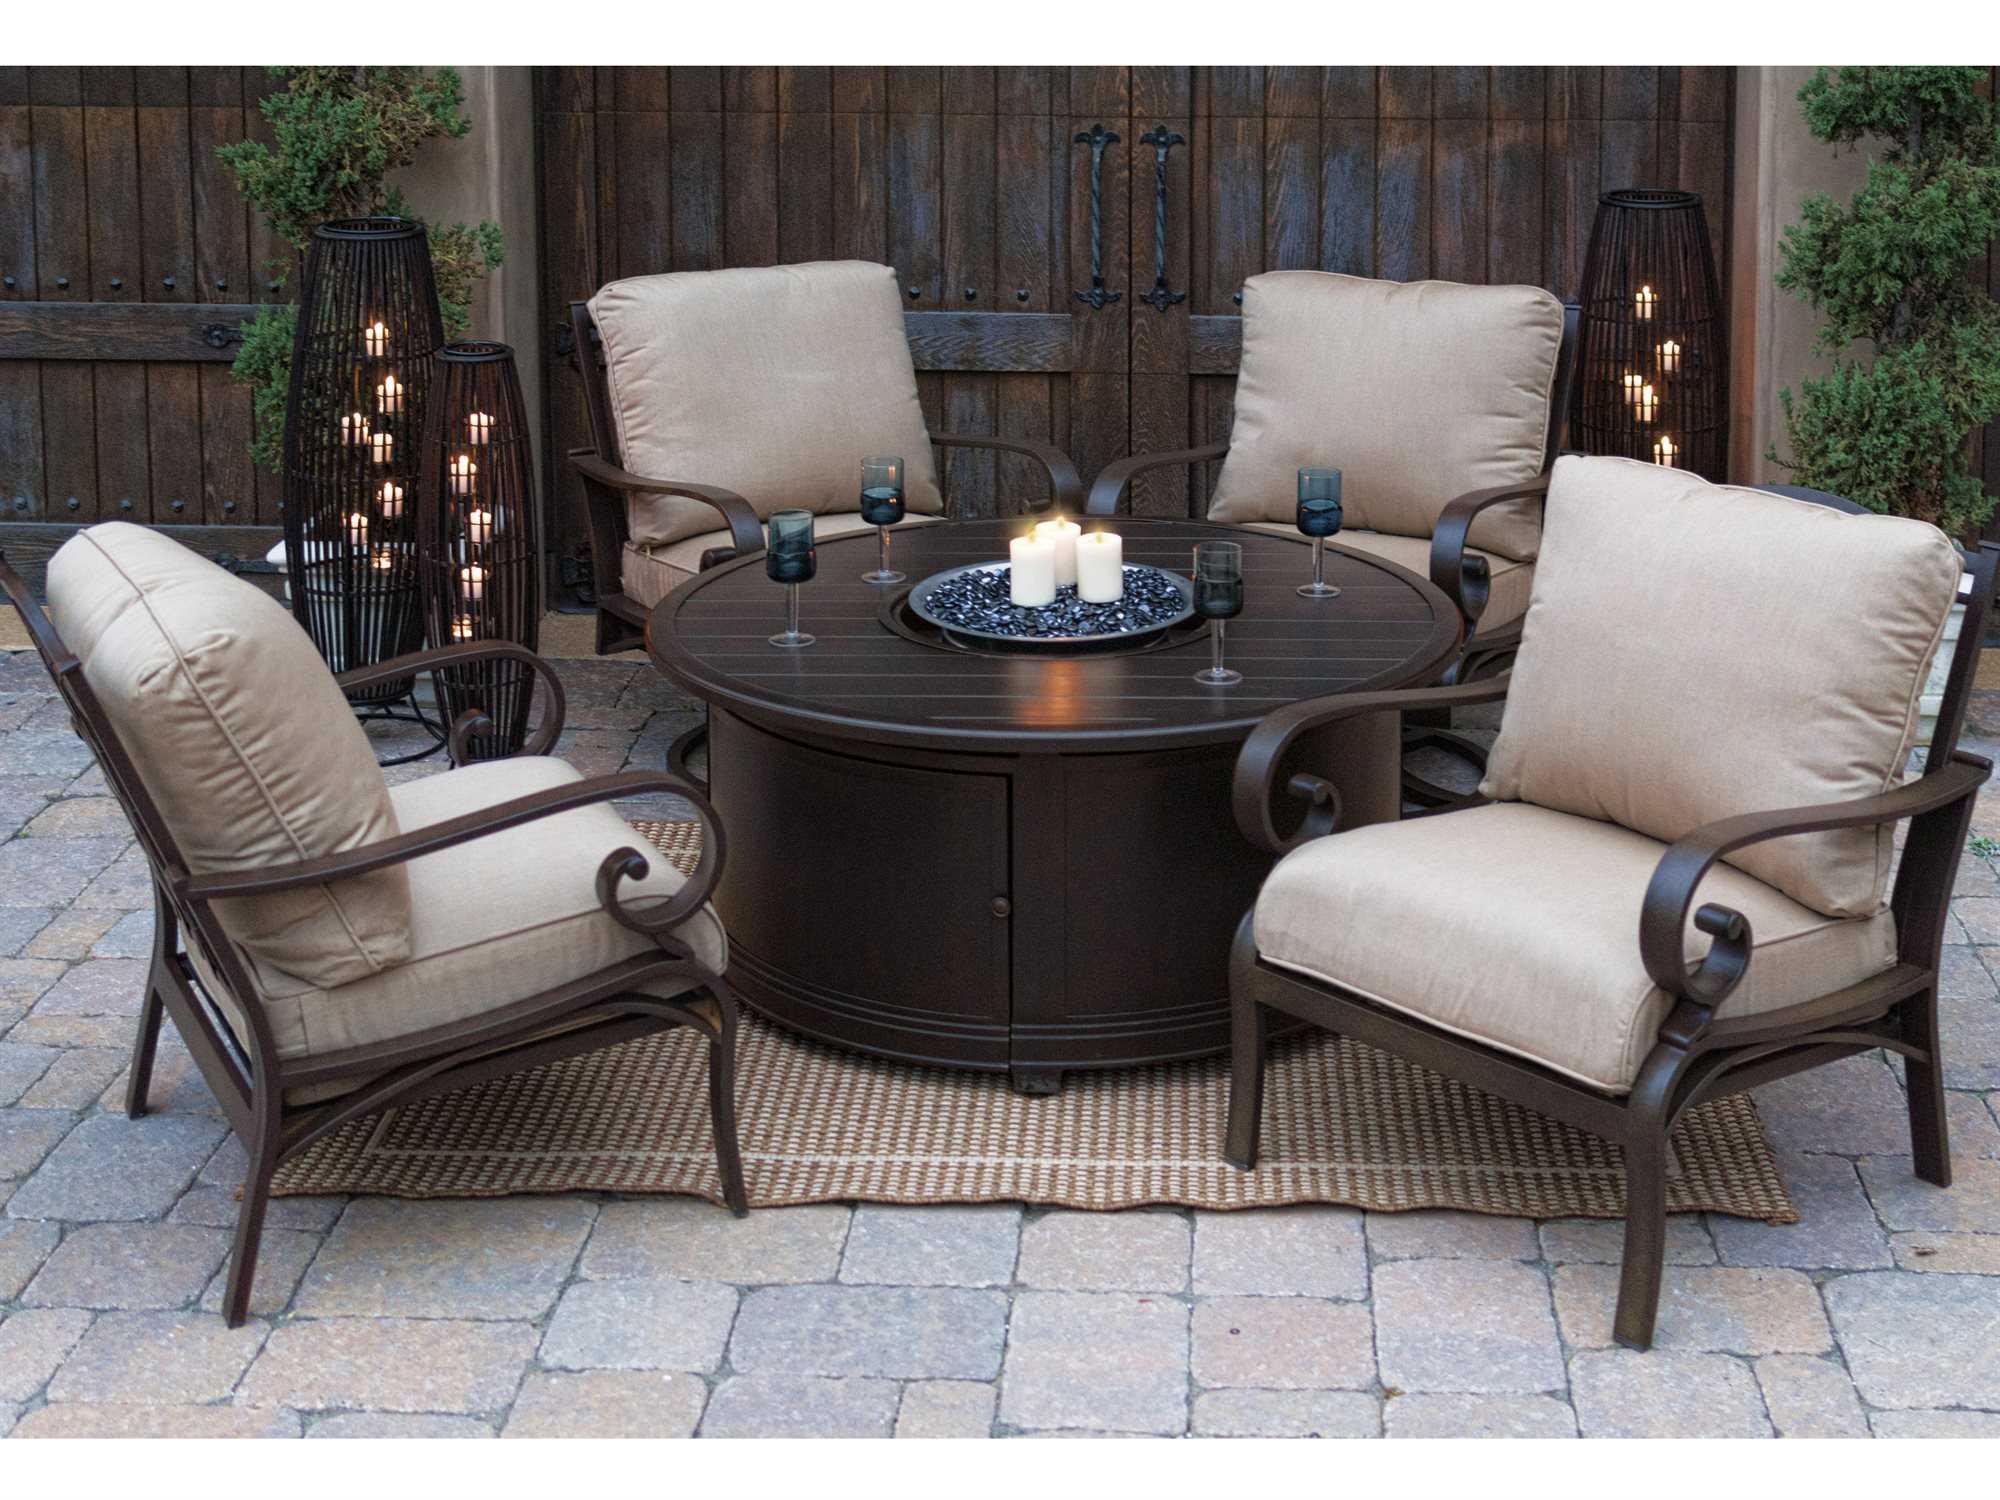 Sunvilla Aluminum 48 Round Slat Top Fire Pit Table in Sunset